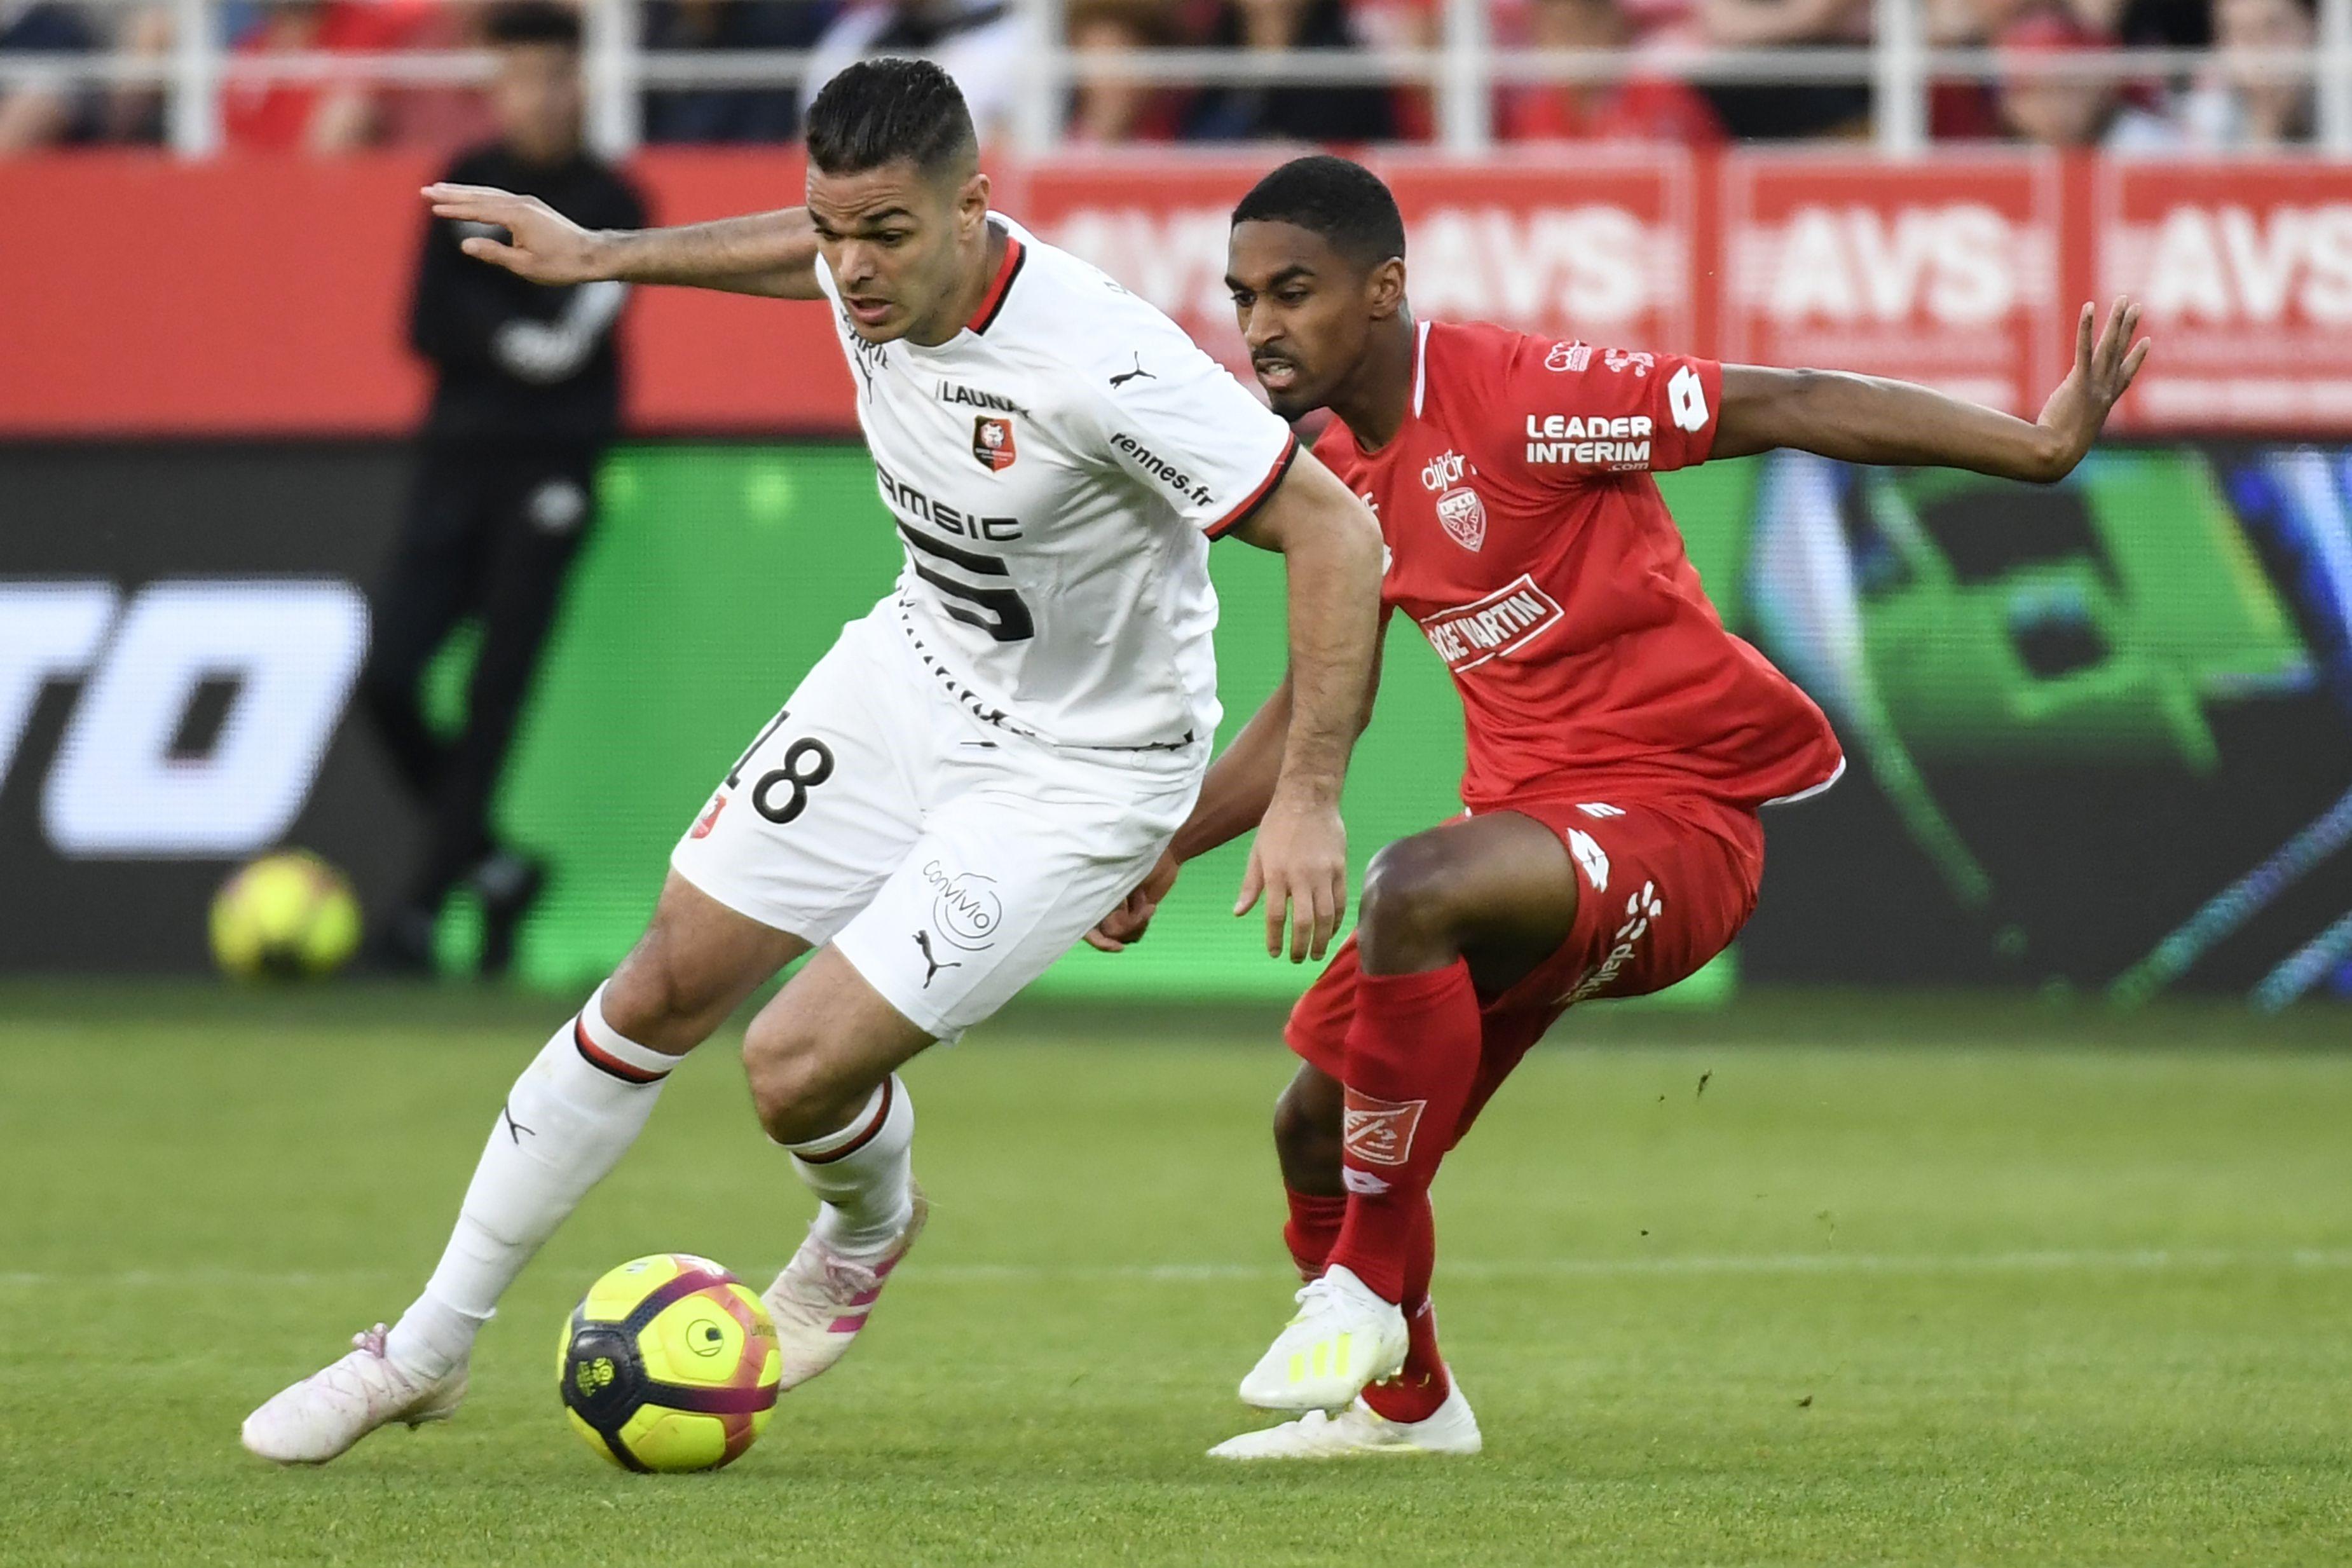 Hatem Ben Arfa et Mickael Alphonse lors de Dijon - Rennes en Ligue 1 le 19 avril 2019